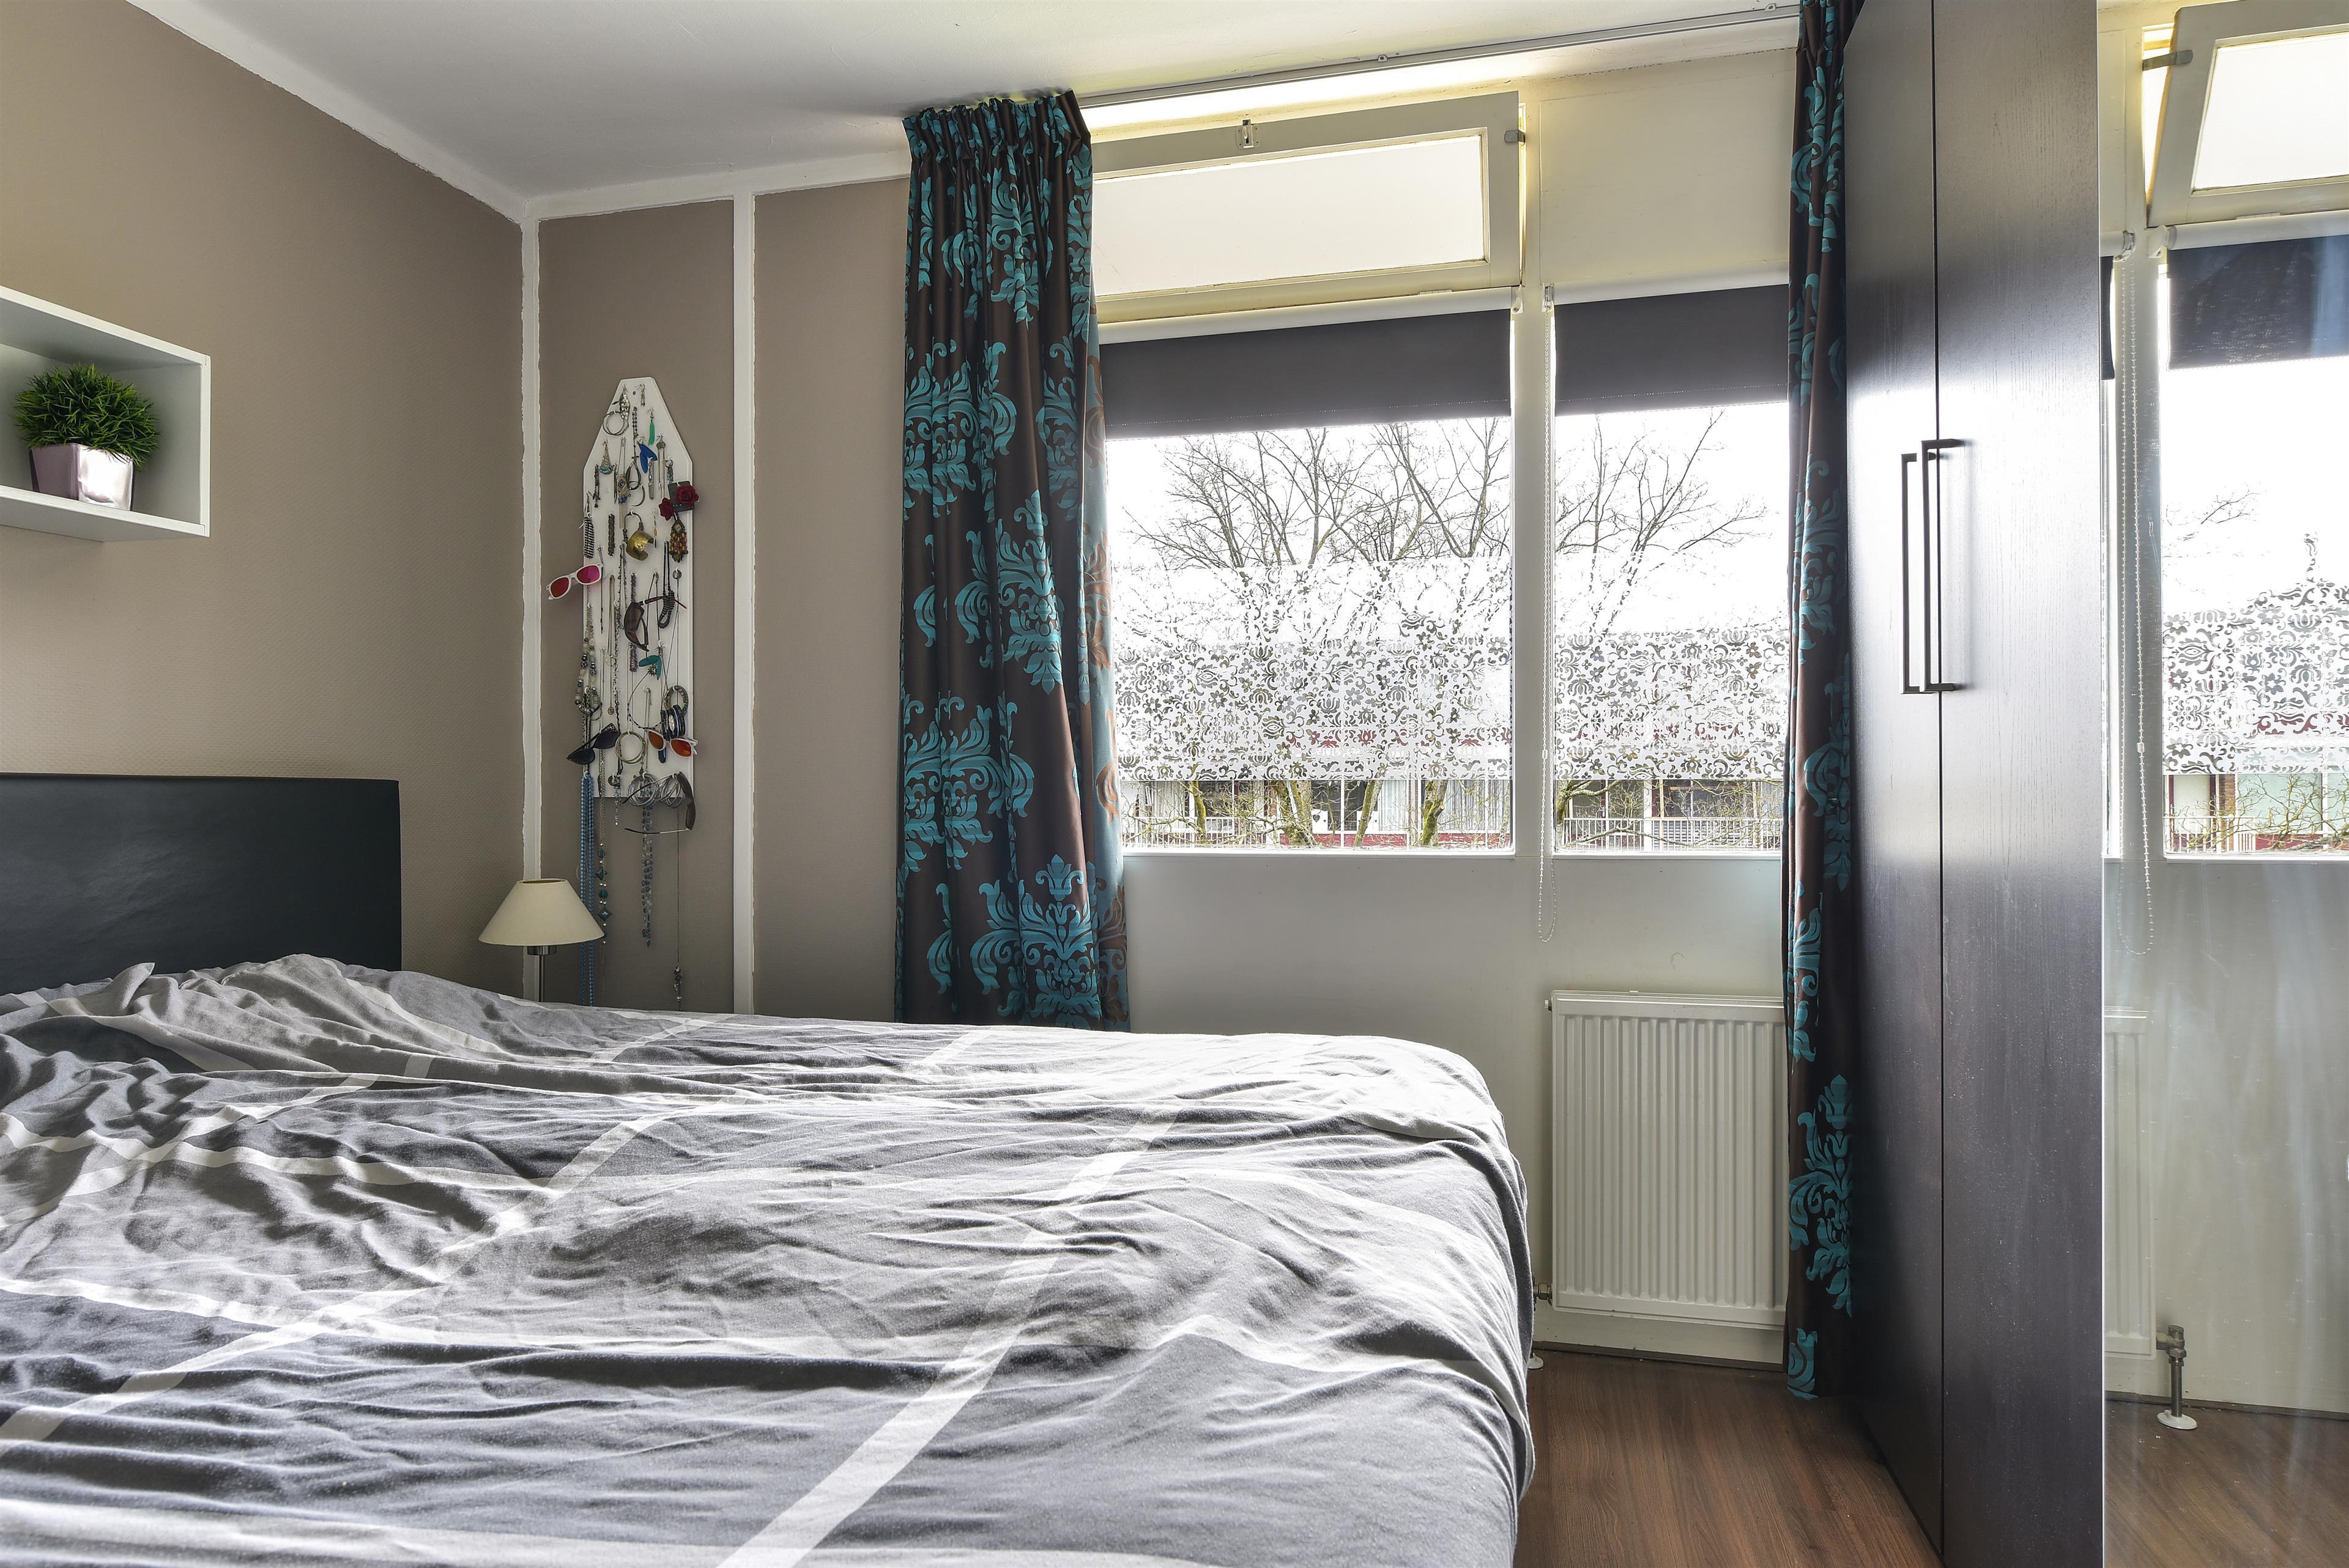 Best De Eetkamer Apeldoorn Contemporary - House Design Ideas 2018 ...